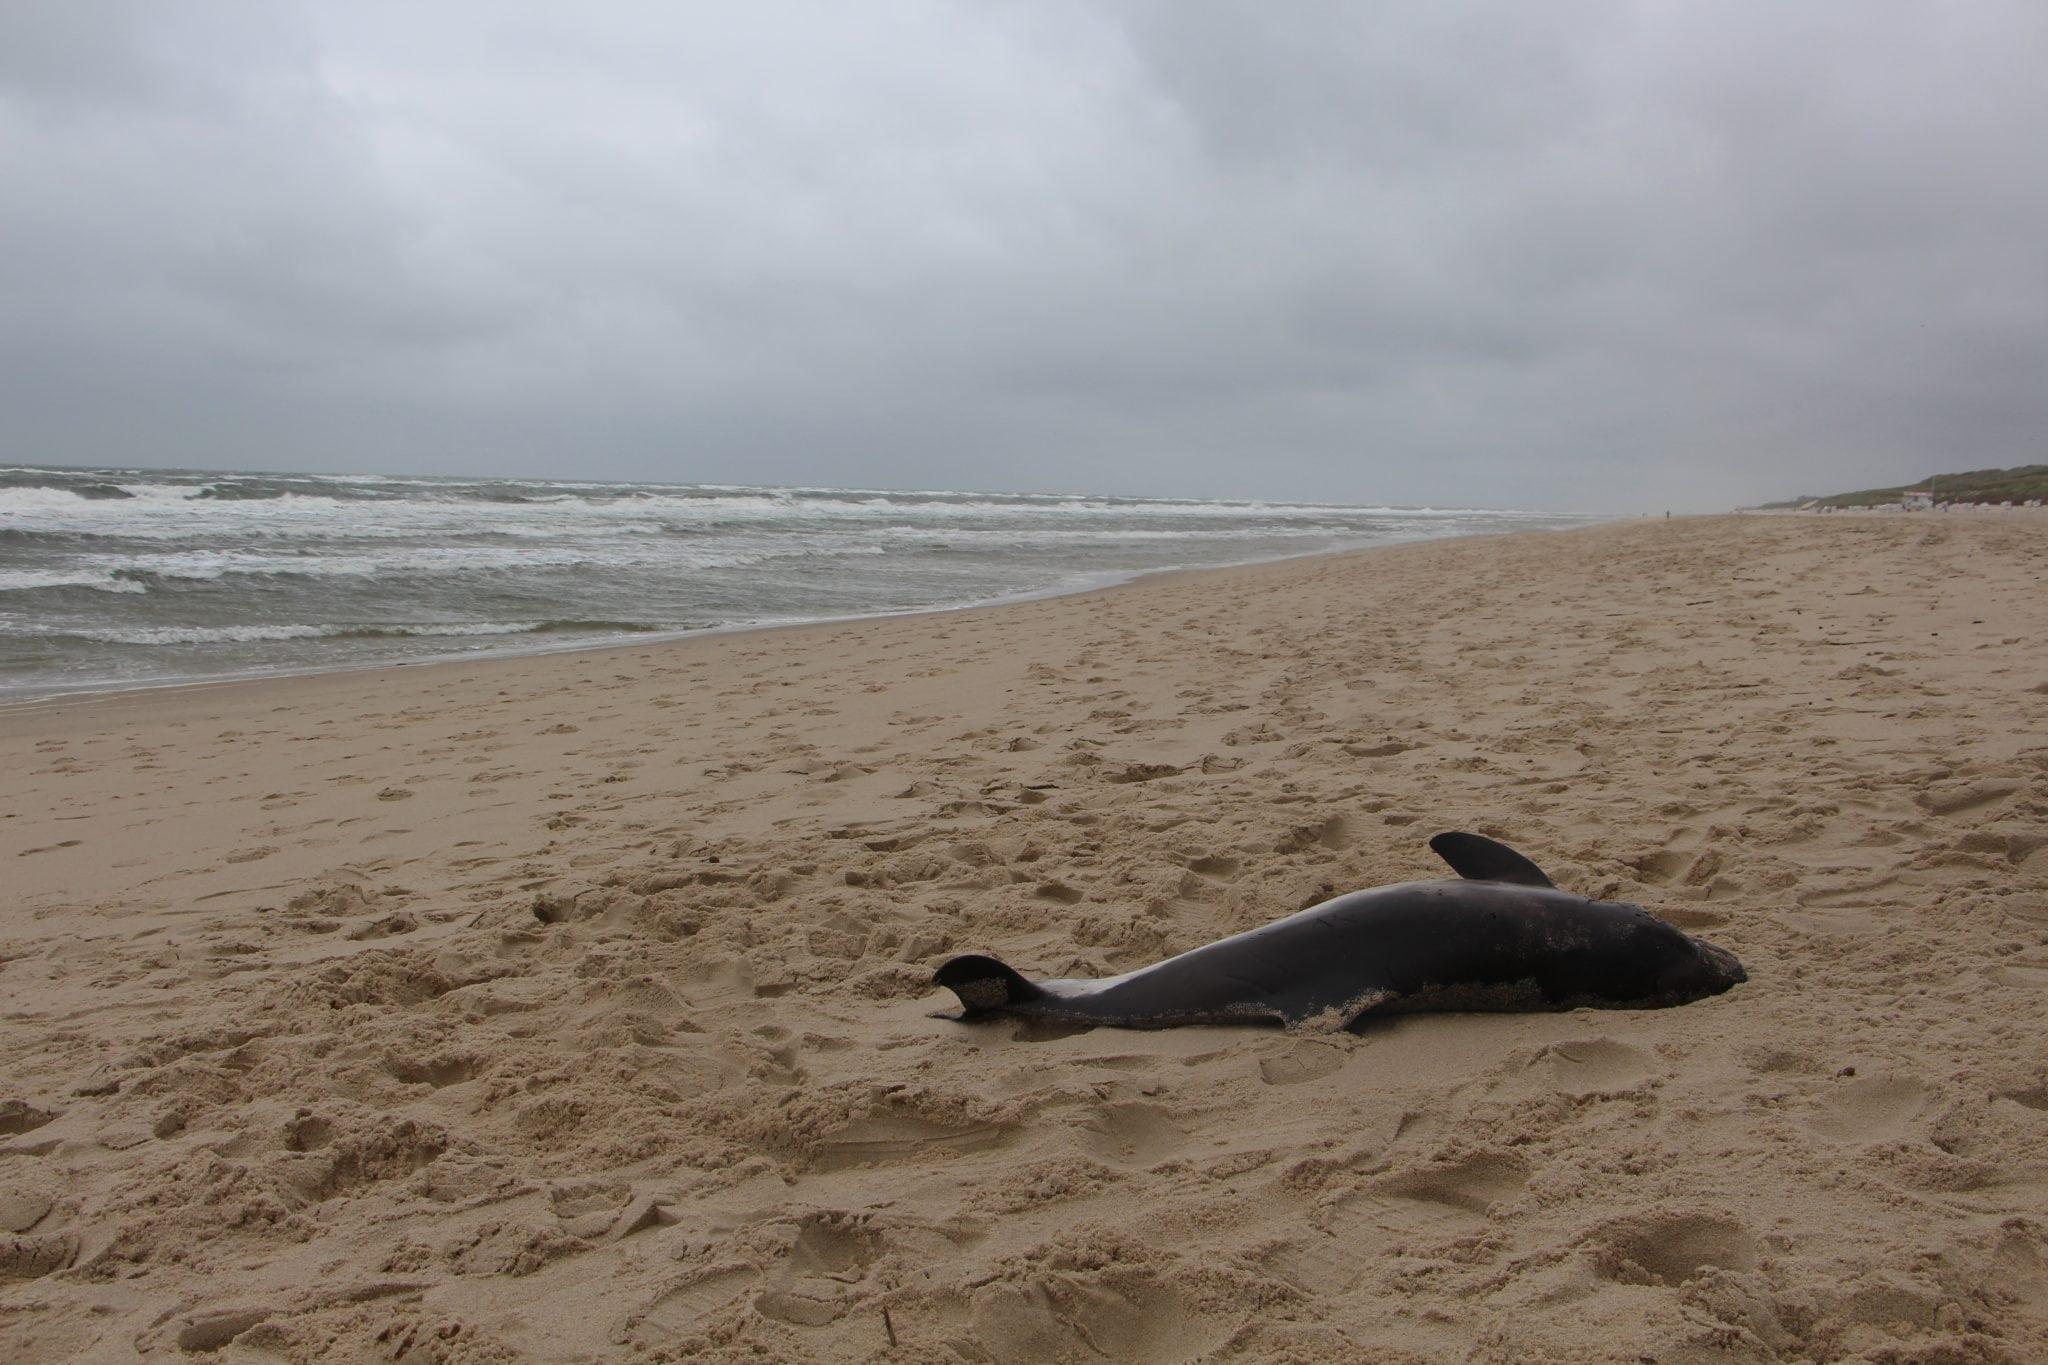 Schweinswal-Strandung Sylt 2018